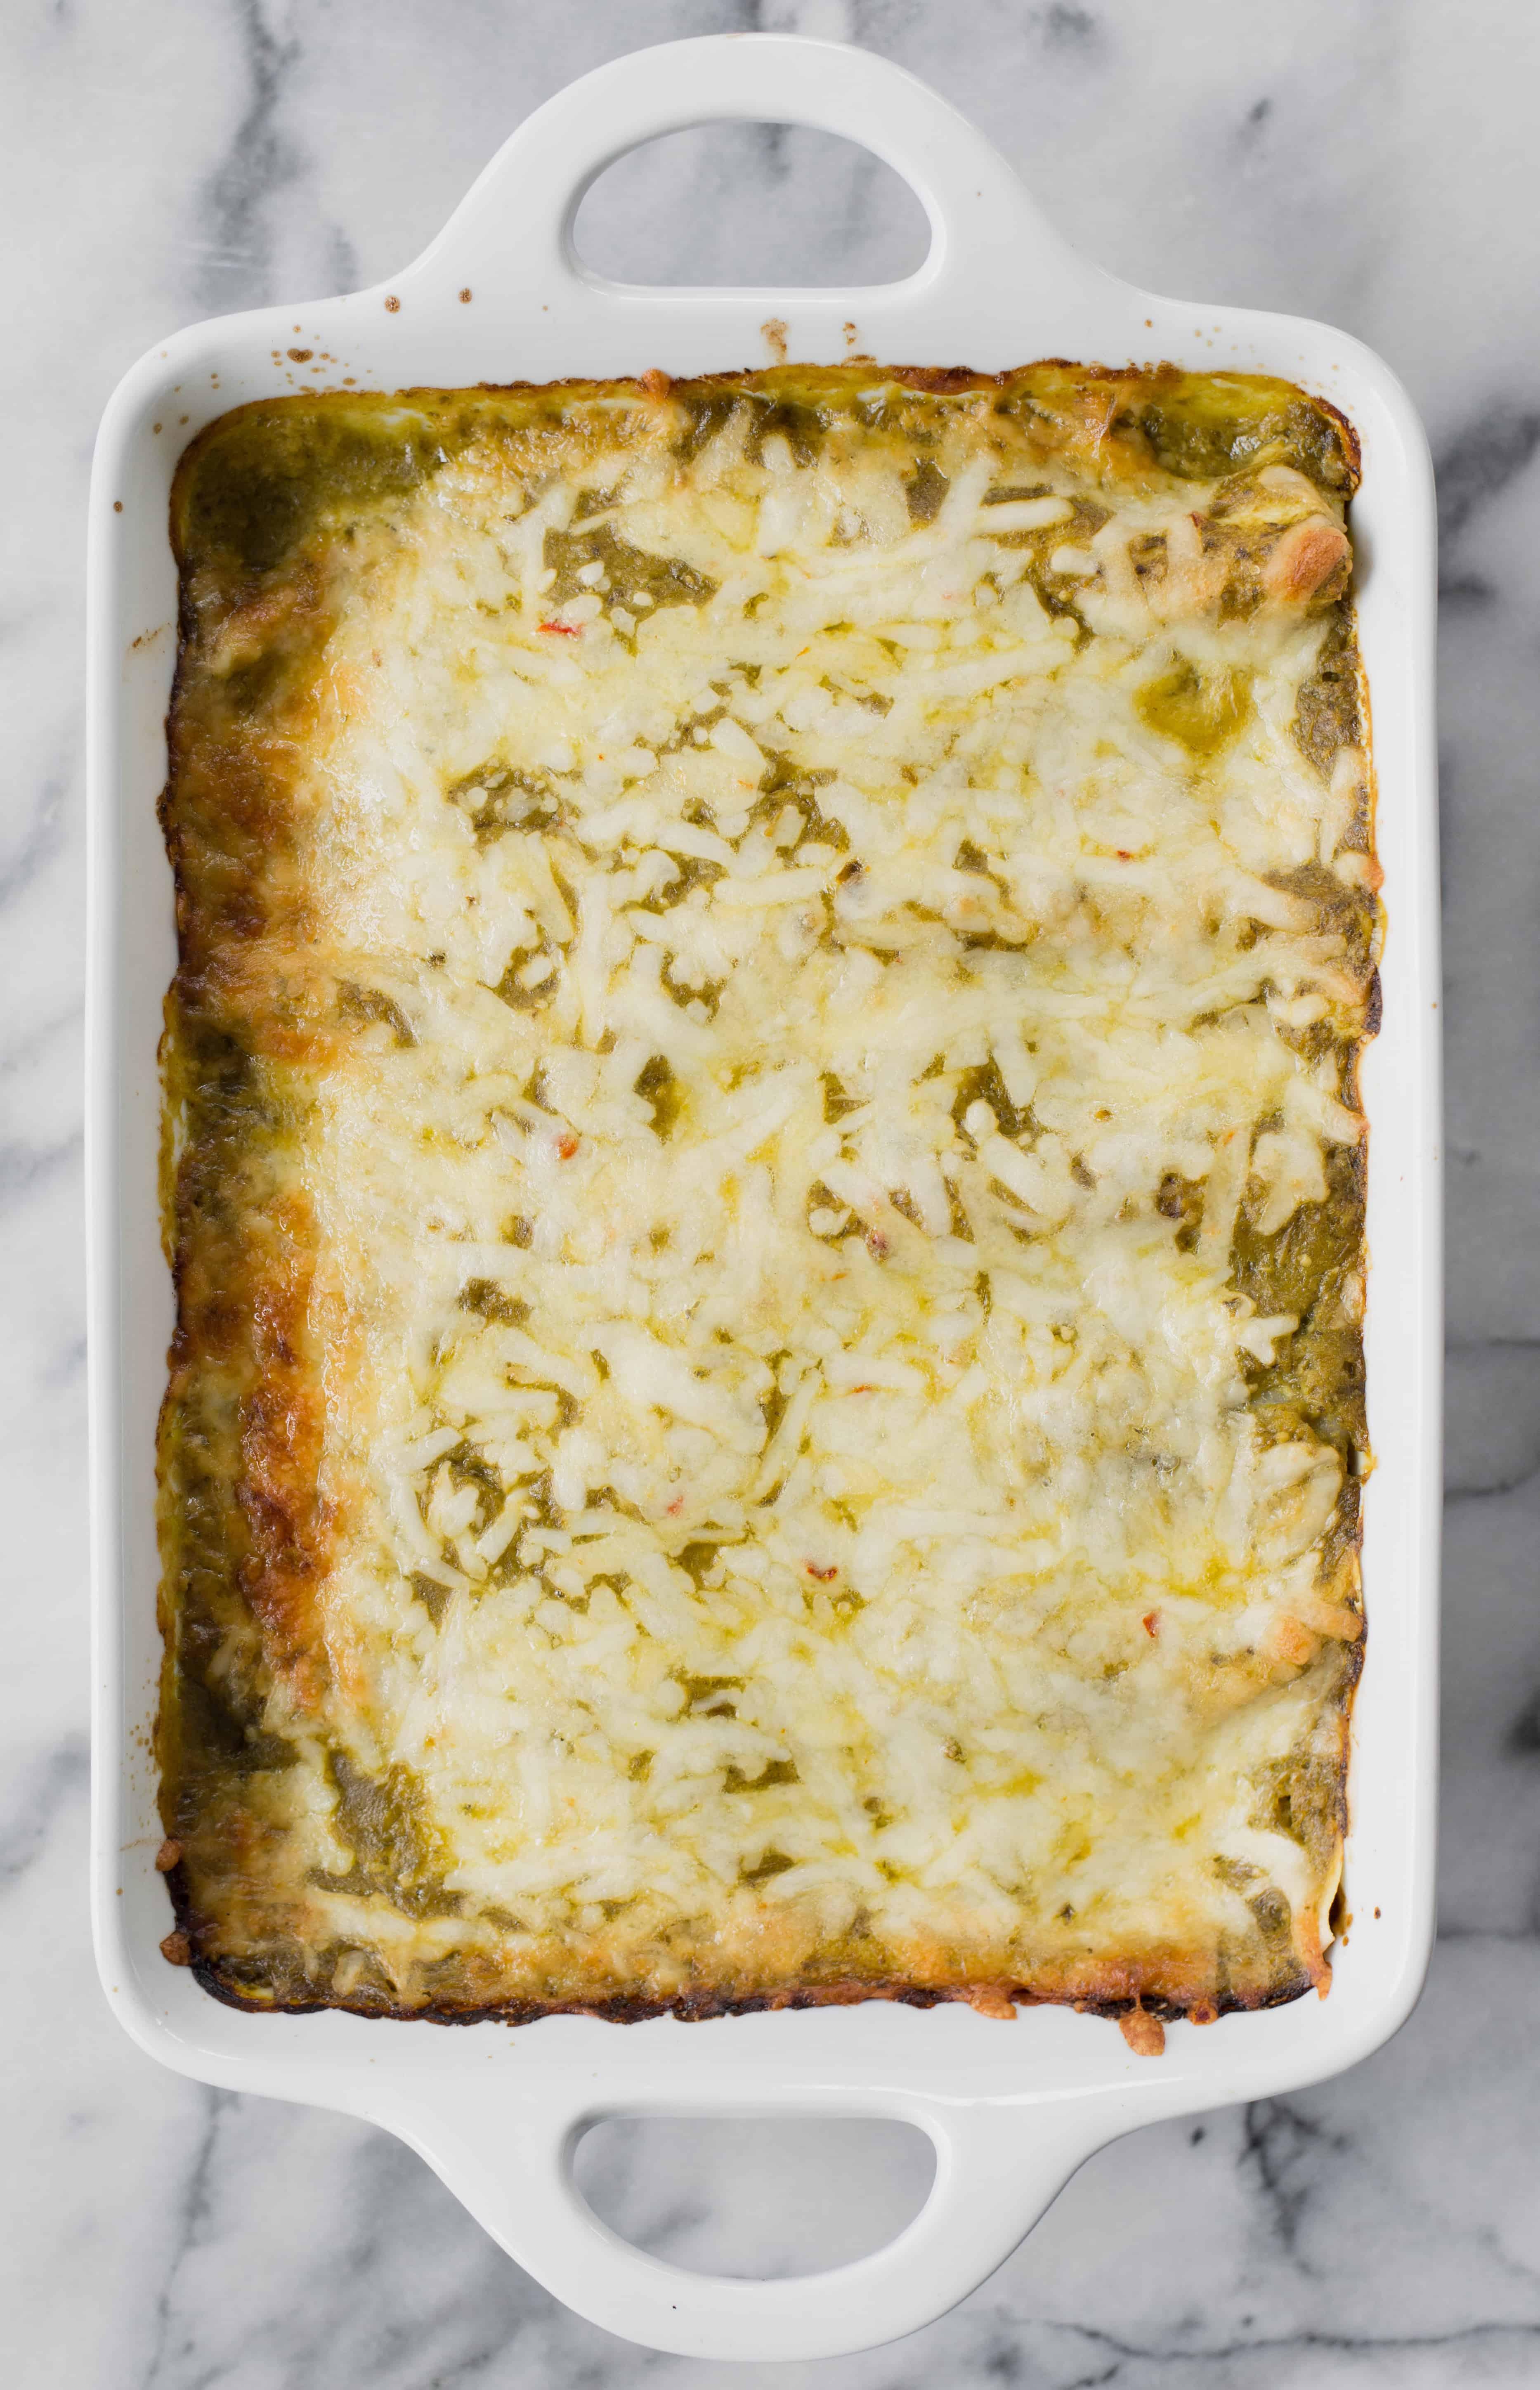 pan of enchiladas verdes